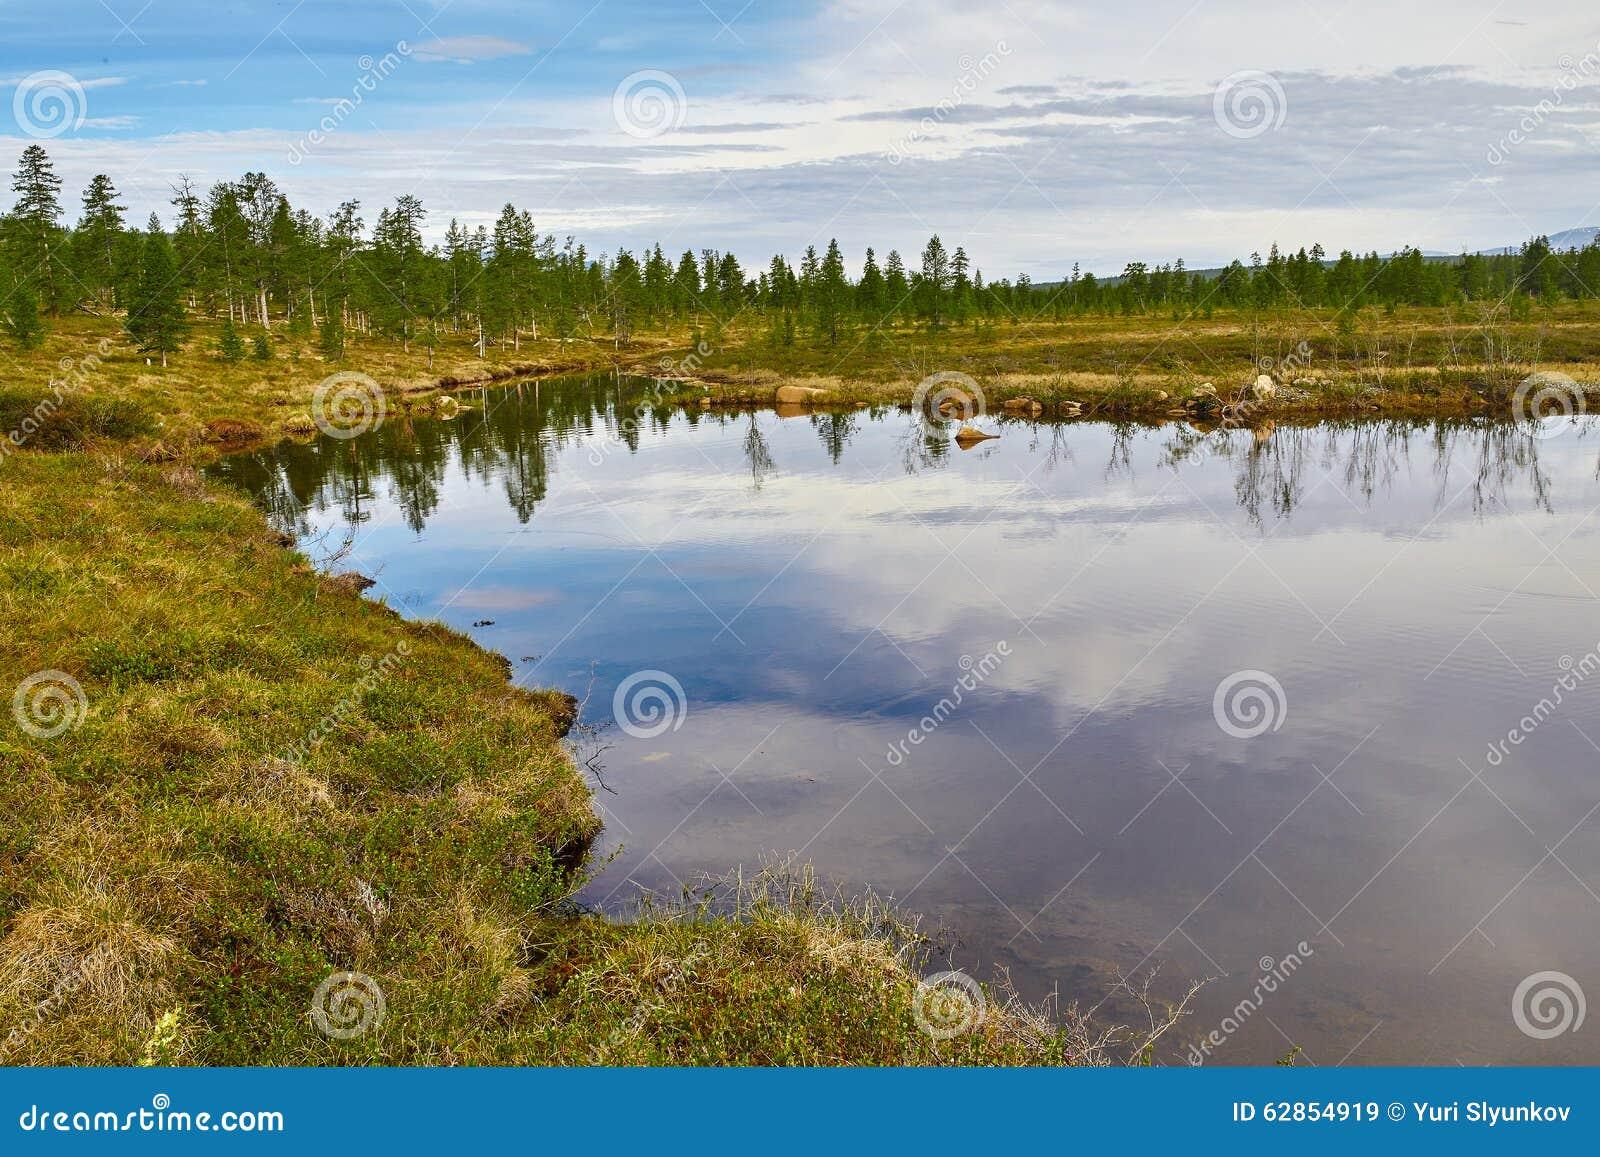 Lake. Autumn. Reflexion. The Magadan area